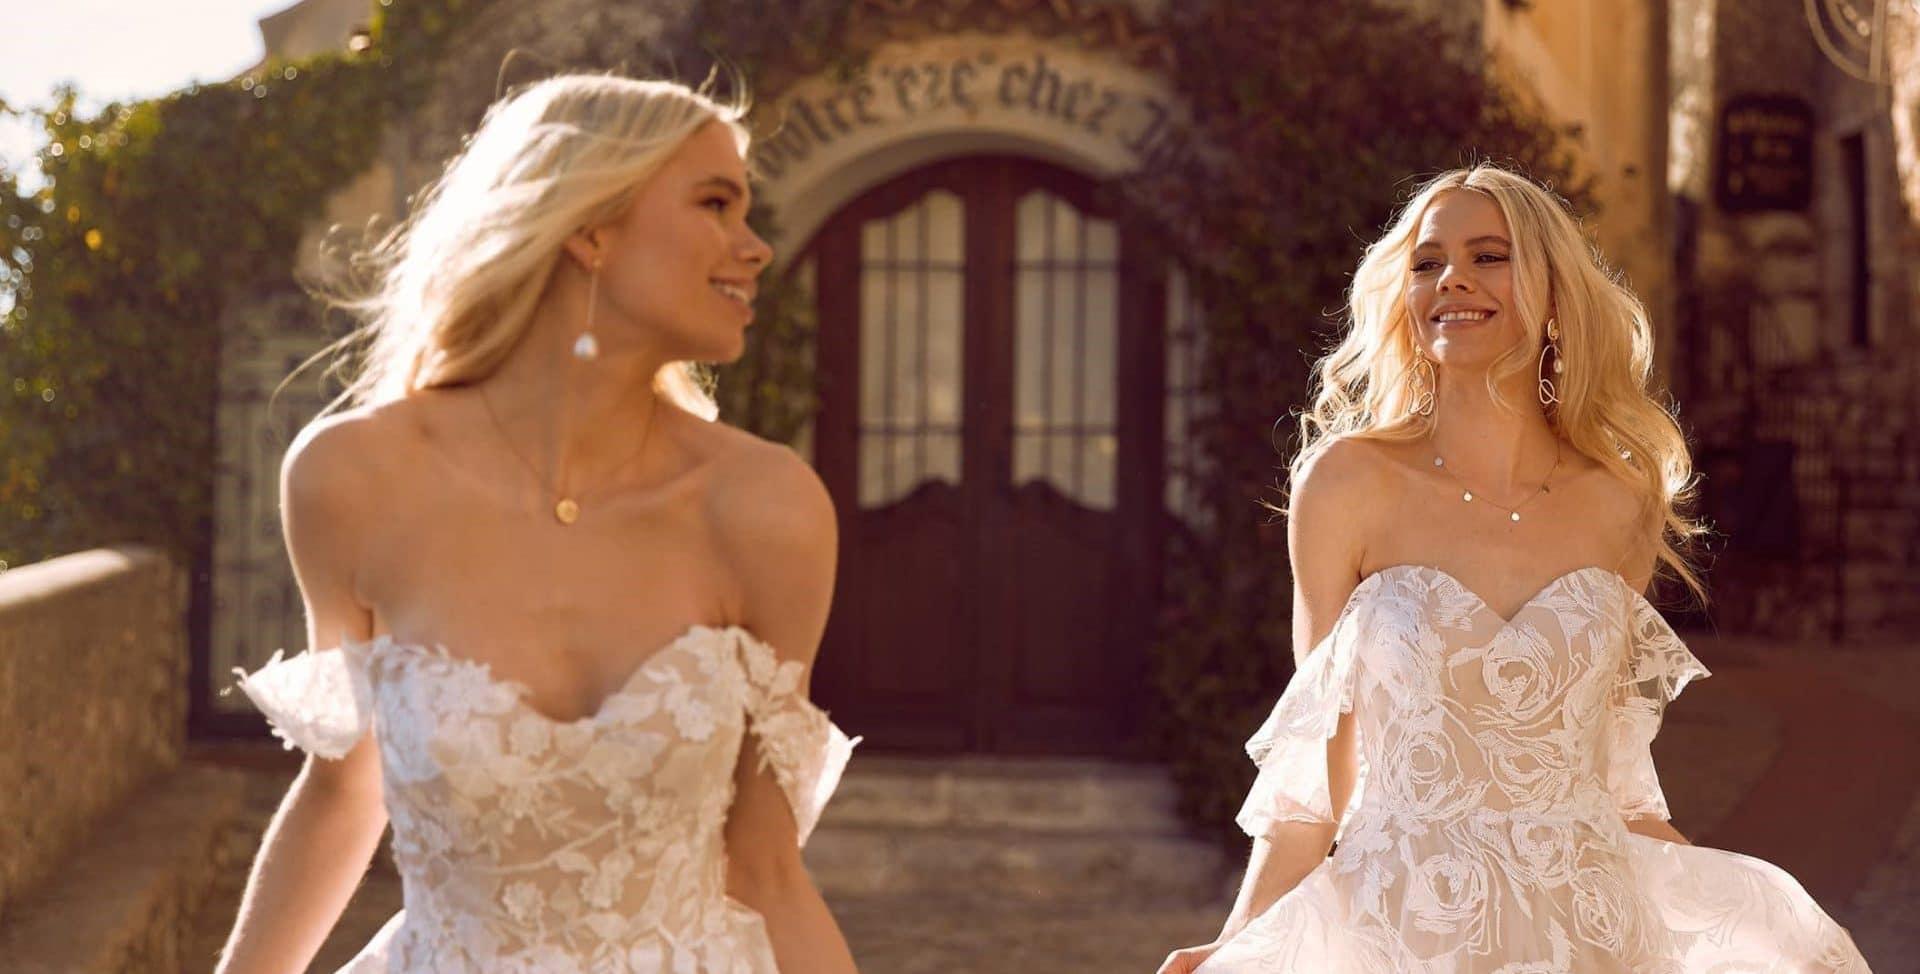 Australia's Madi Lane Bridal Preview Event - May 2019